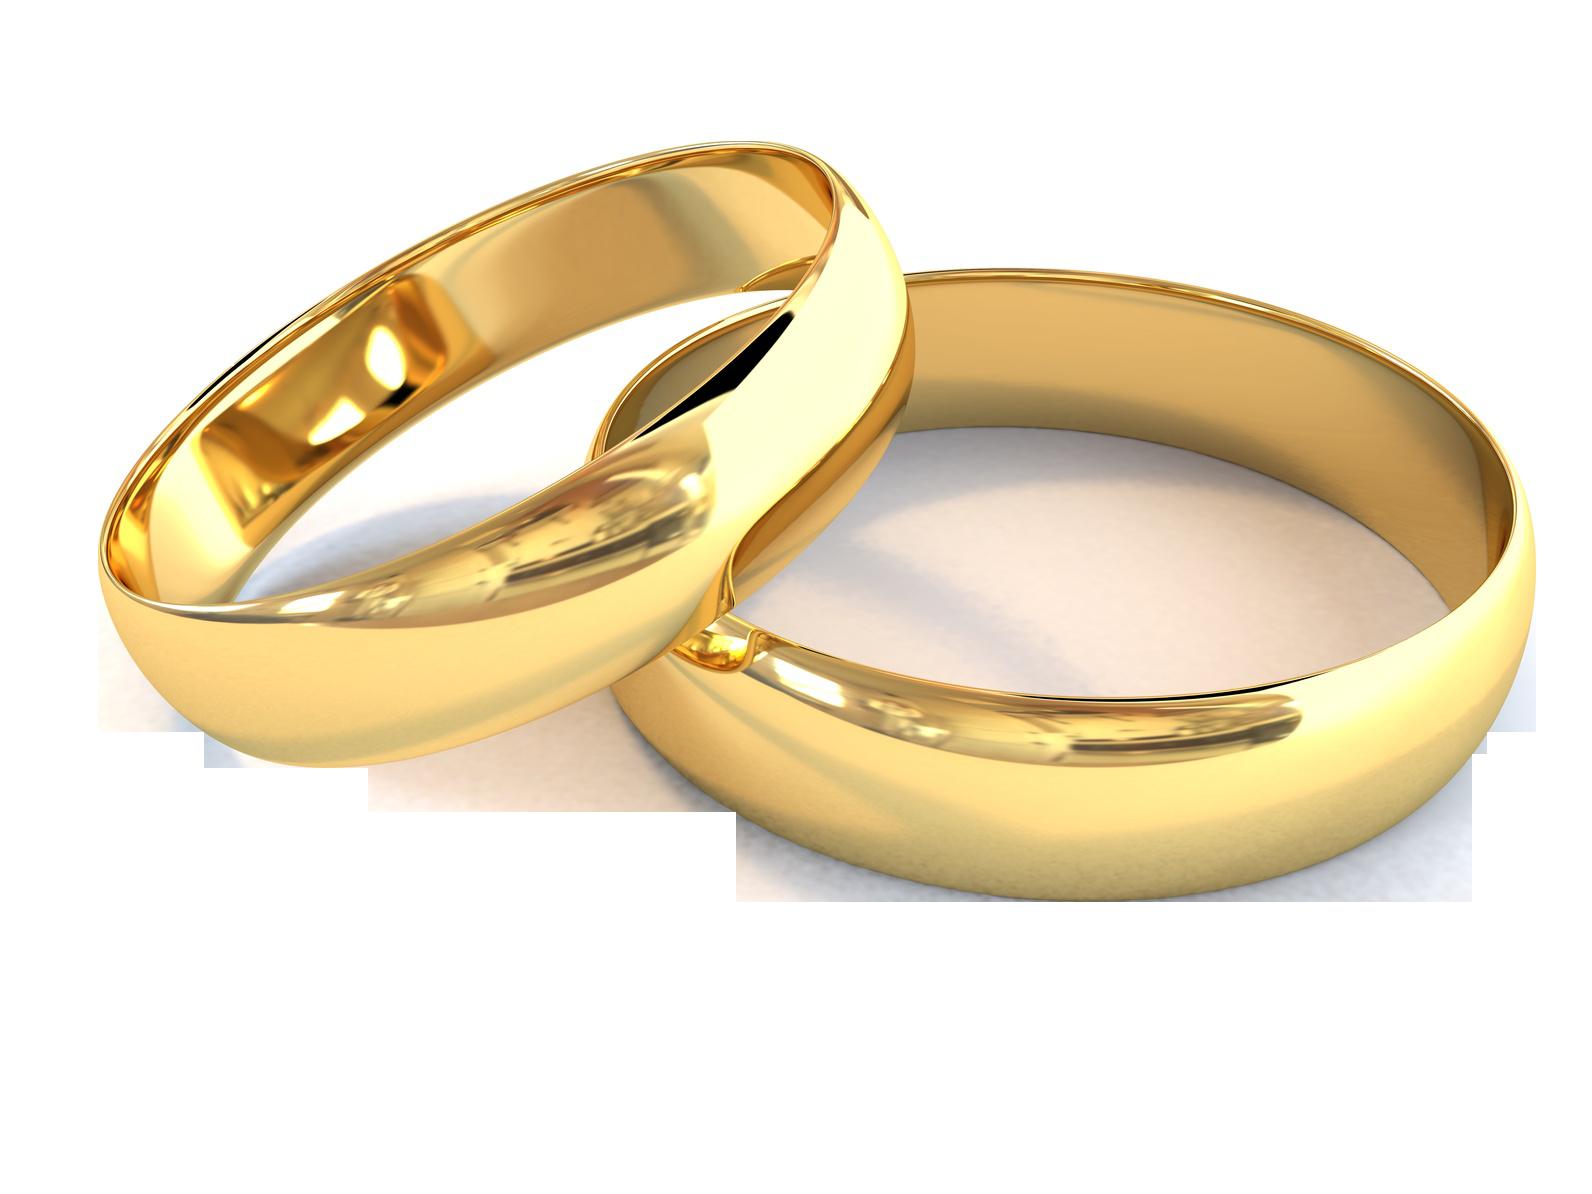 Golden Wedding Bells Png Hd